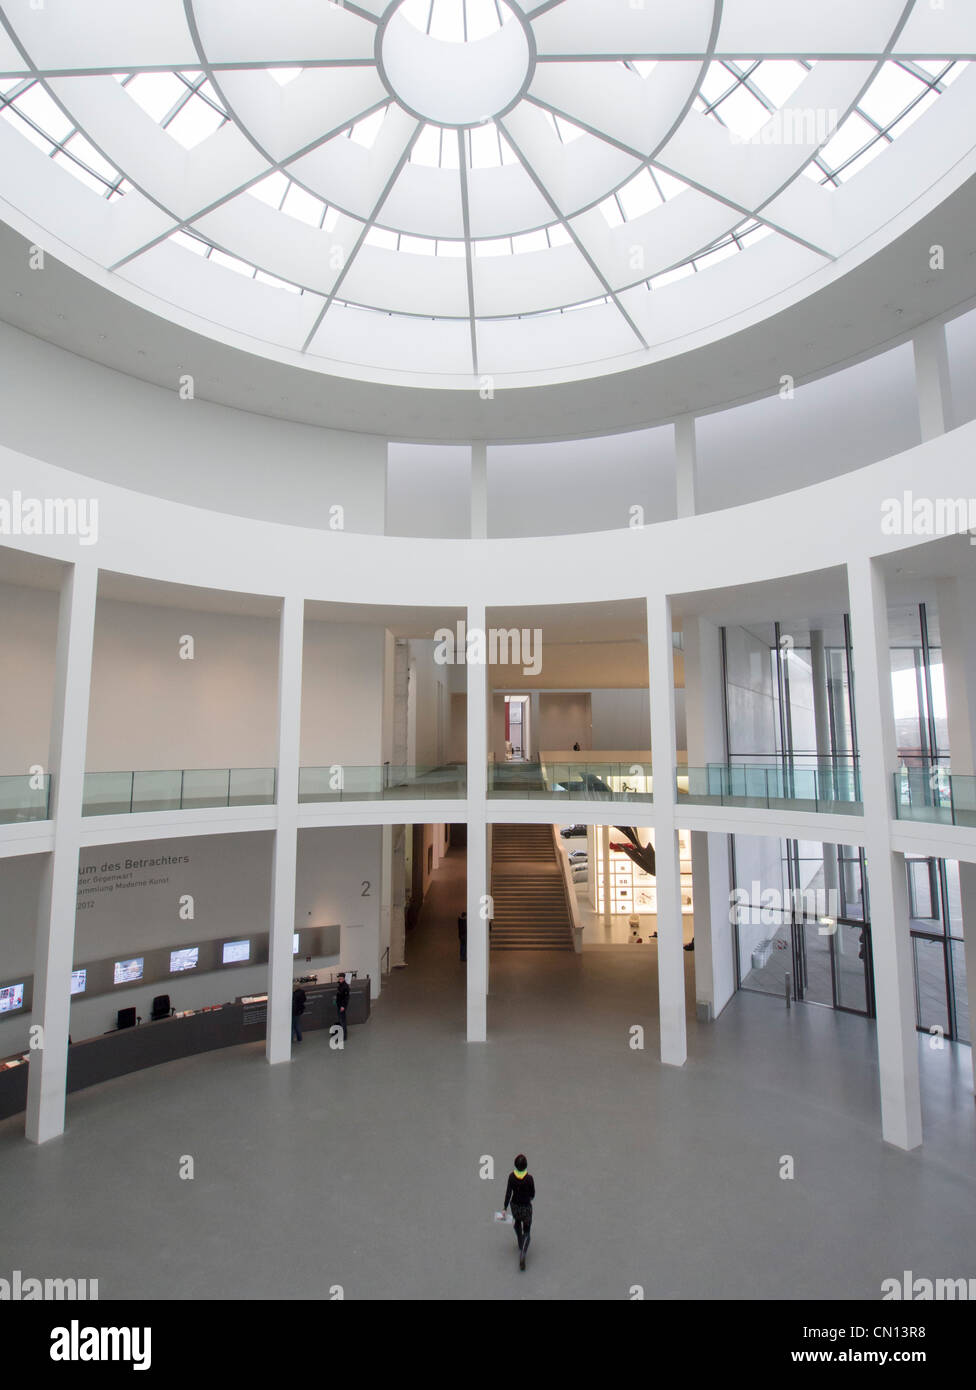 Entrance atrium at Pinakothek Moderne art museum in Munich Germany Stock Photo